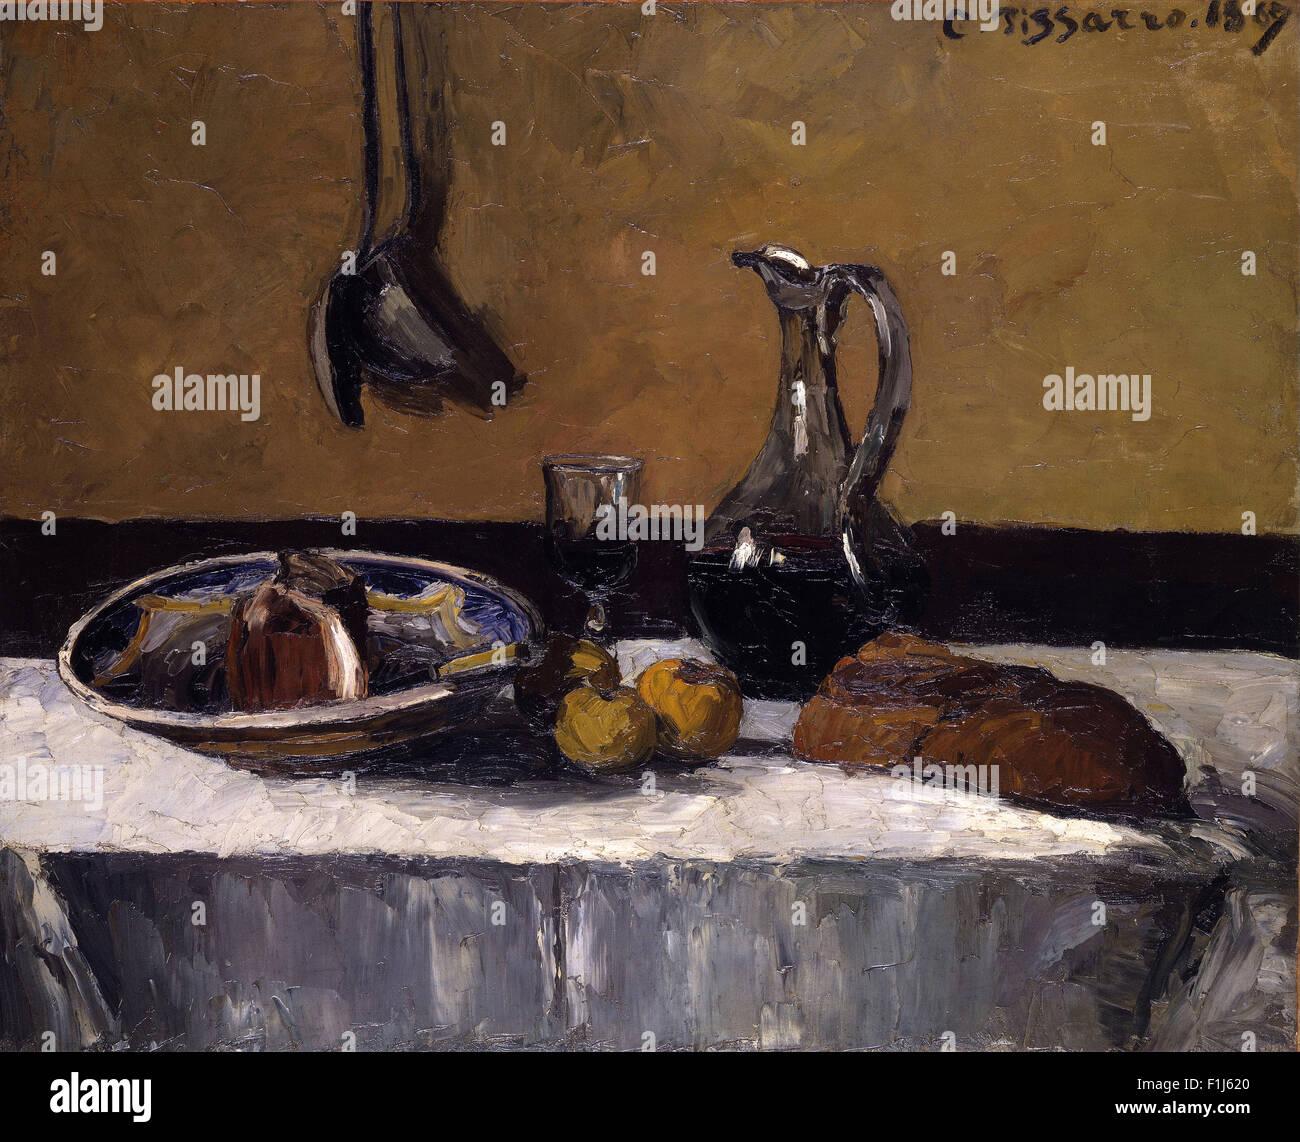 Camille Pissarro - Bodegón Imagen De Stock